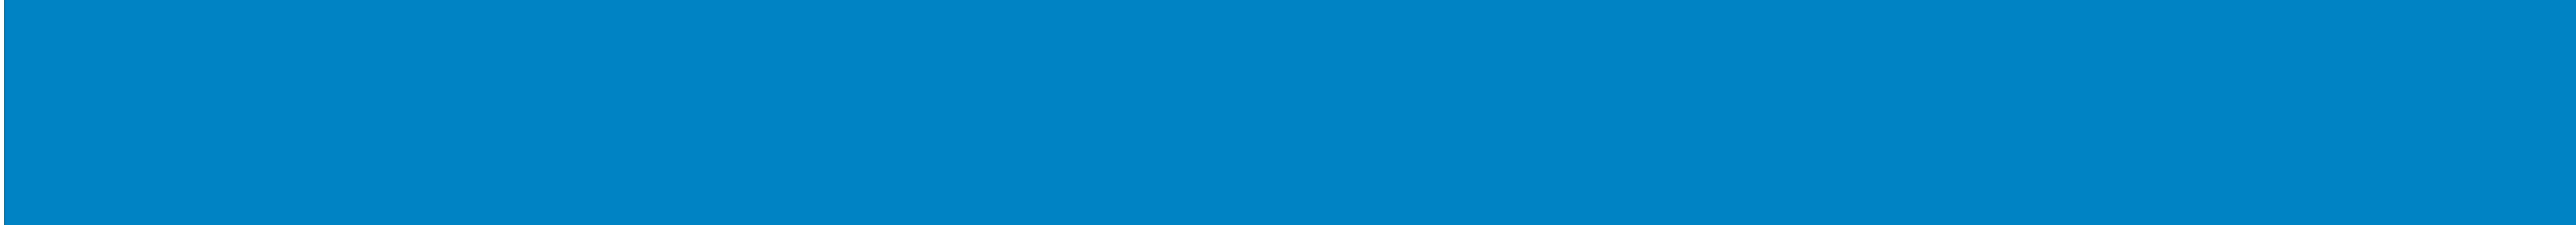 blue-bar-2.png